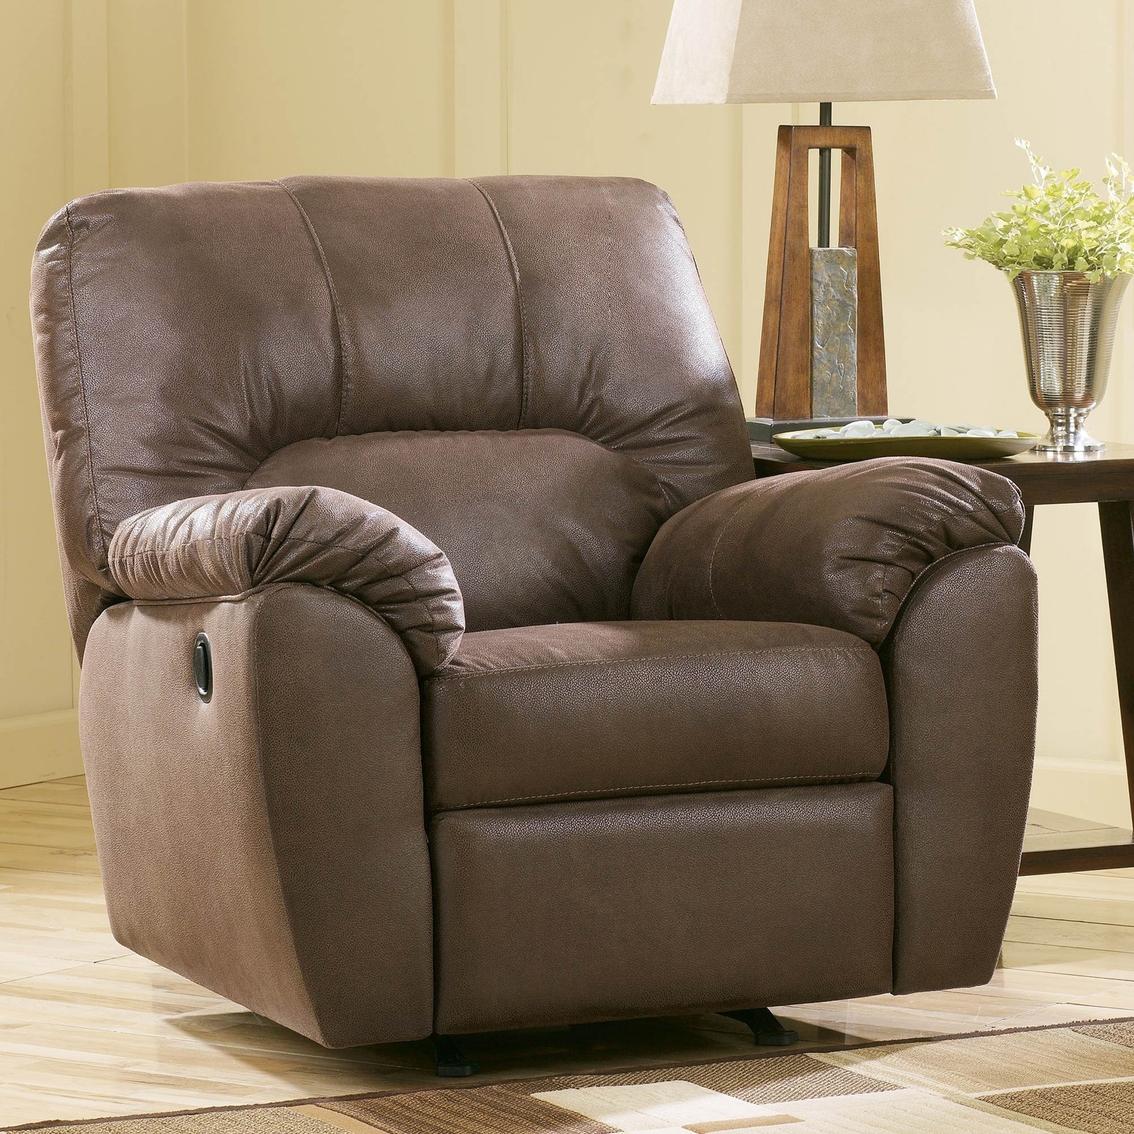 www recliner chairs outdoor patio lounge chair ashley amazon walnut rocker furniture